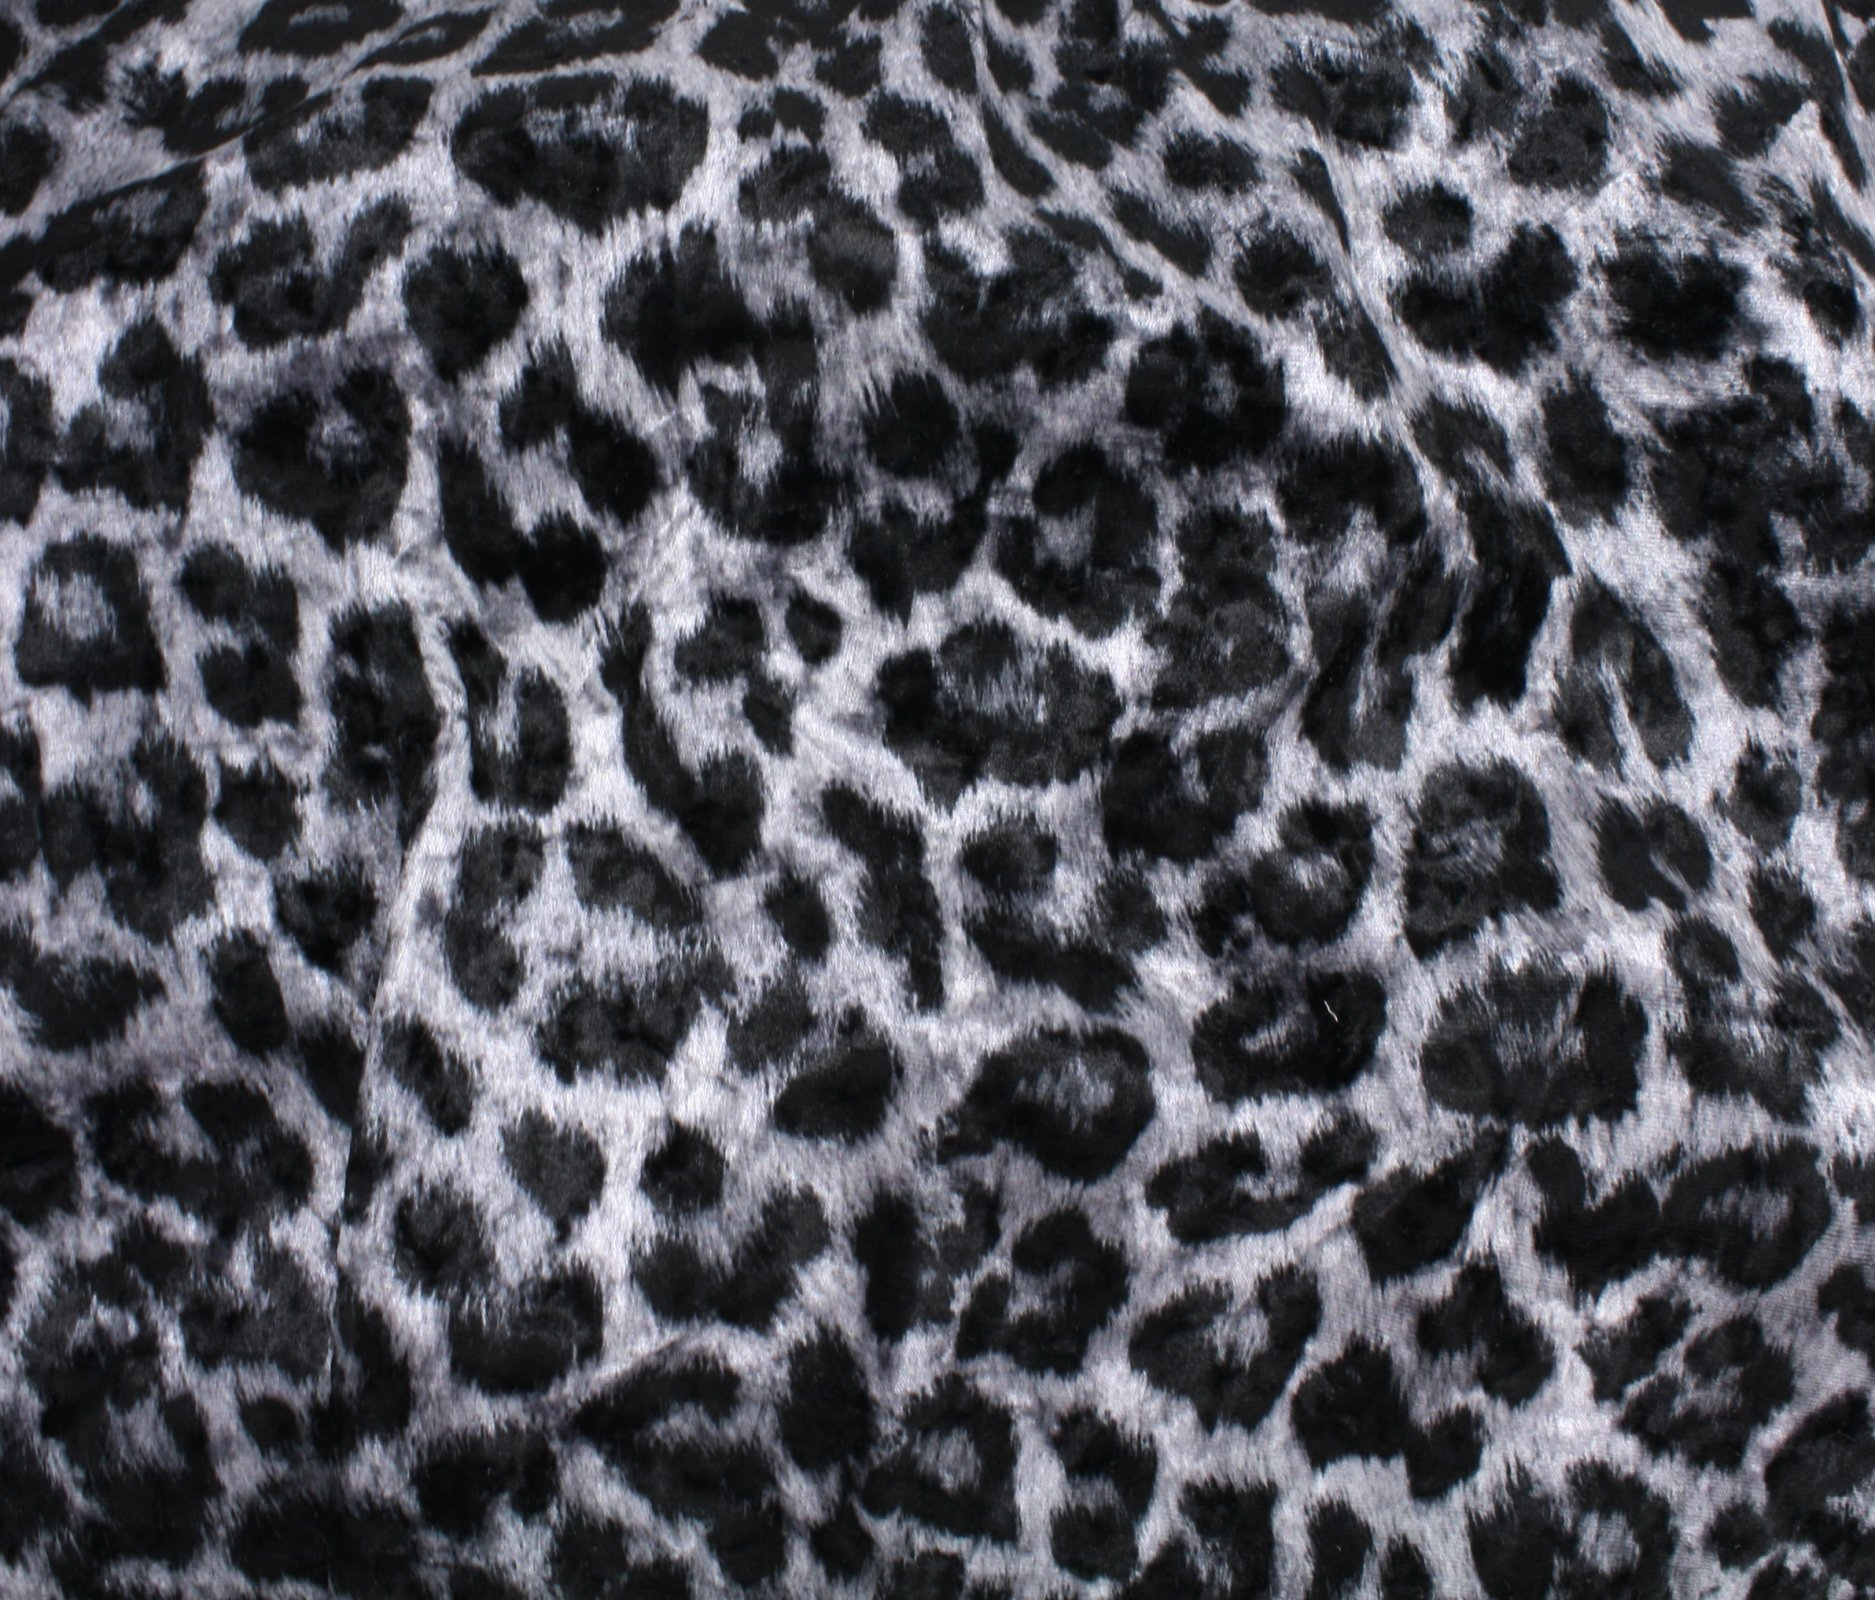 Children Fabric animal print Grey Leopard Print Cotton Elastane Printed Jersey